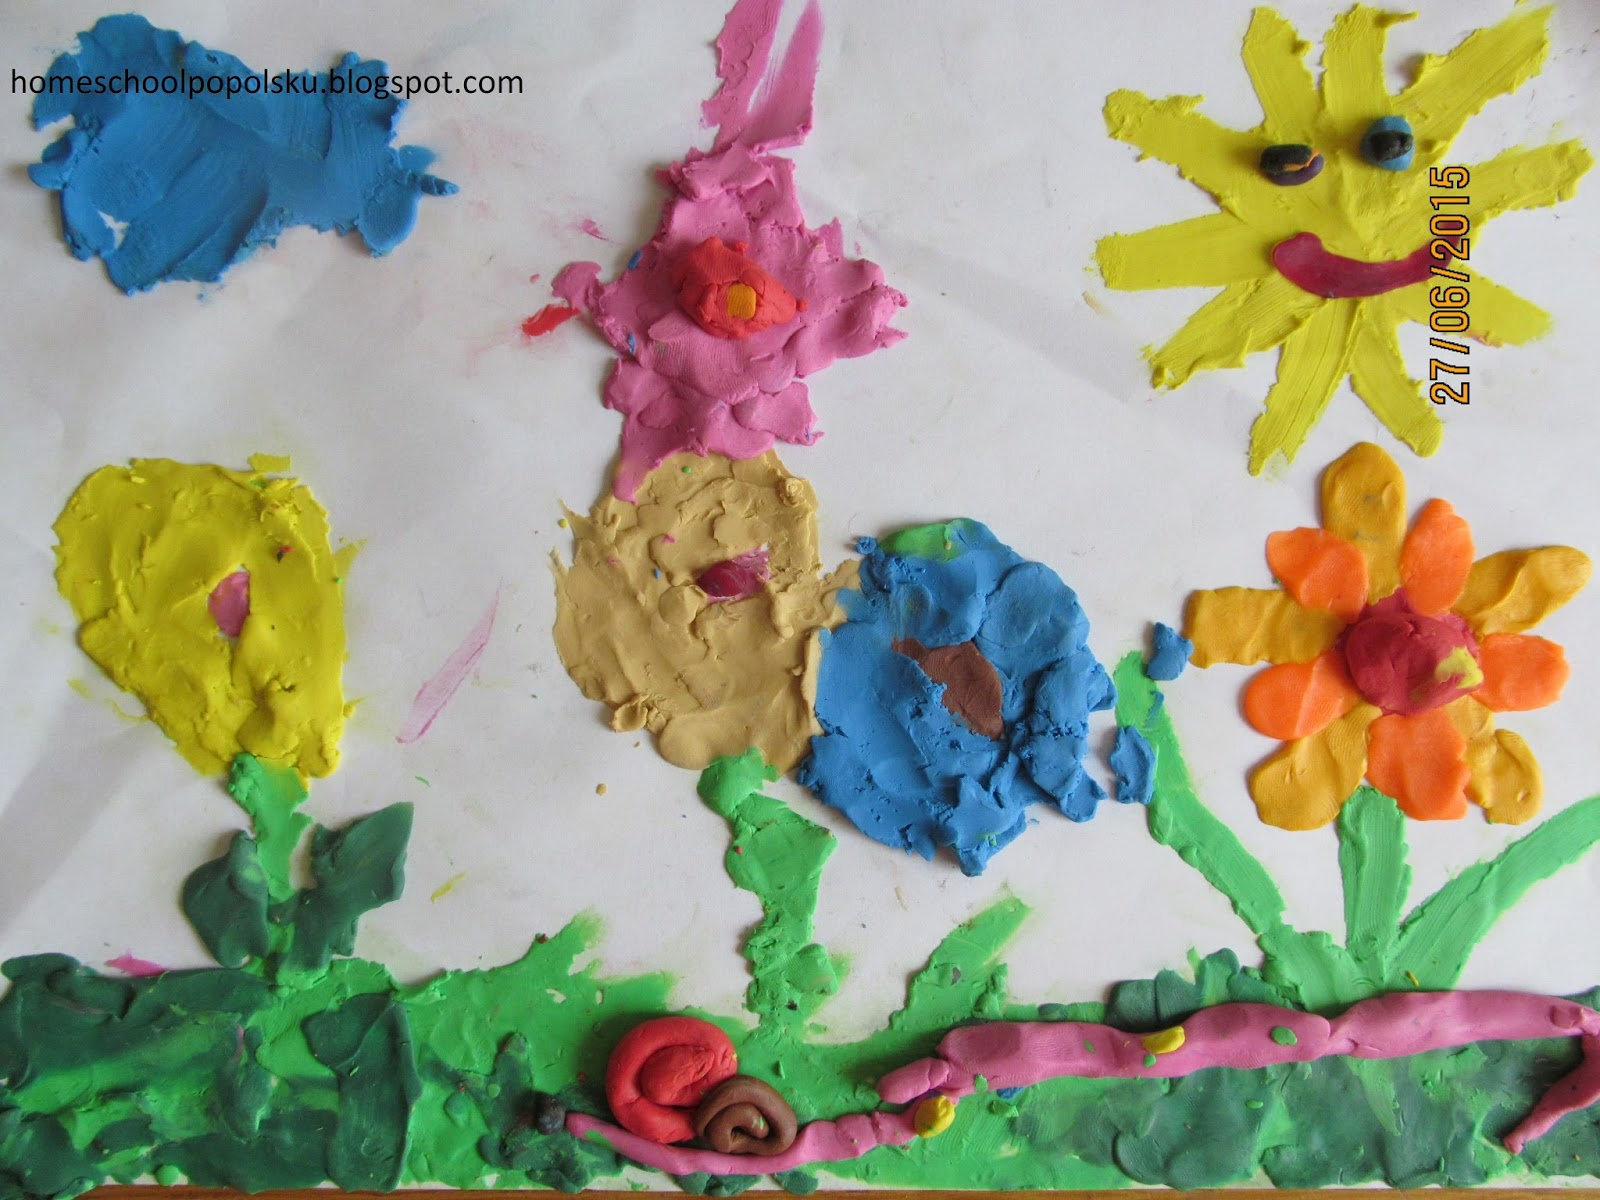 homeschoolpopolsku: kwiaty na łące-plastelina